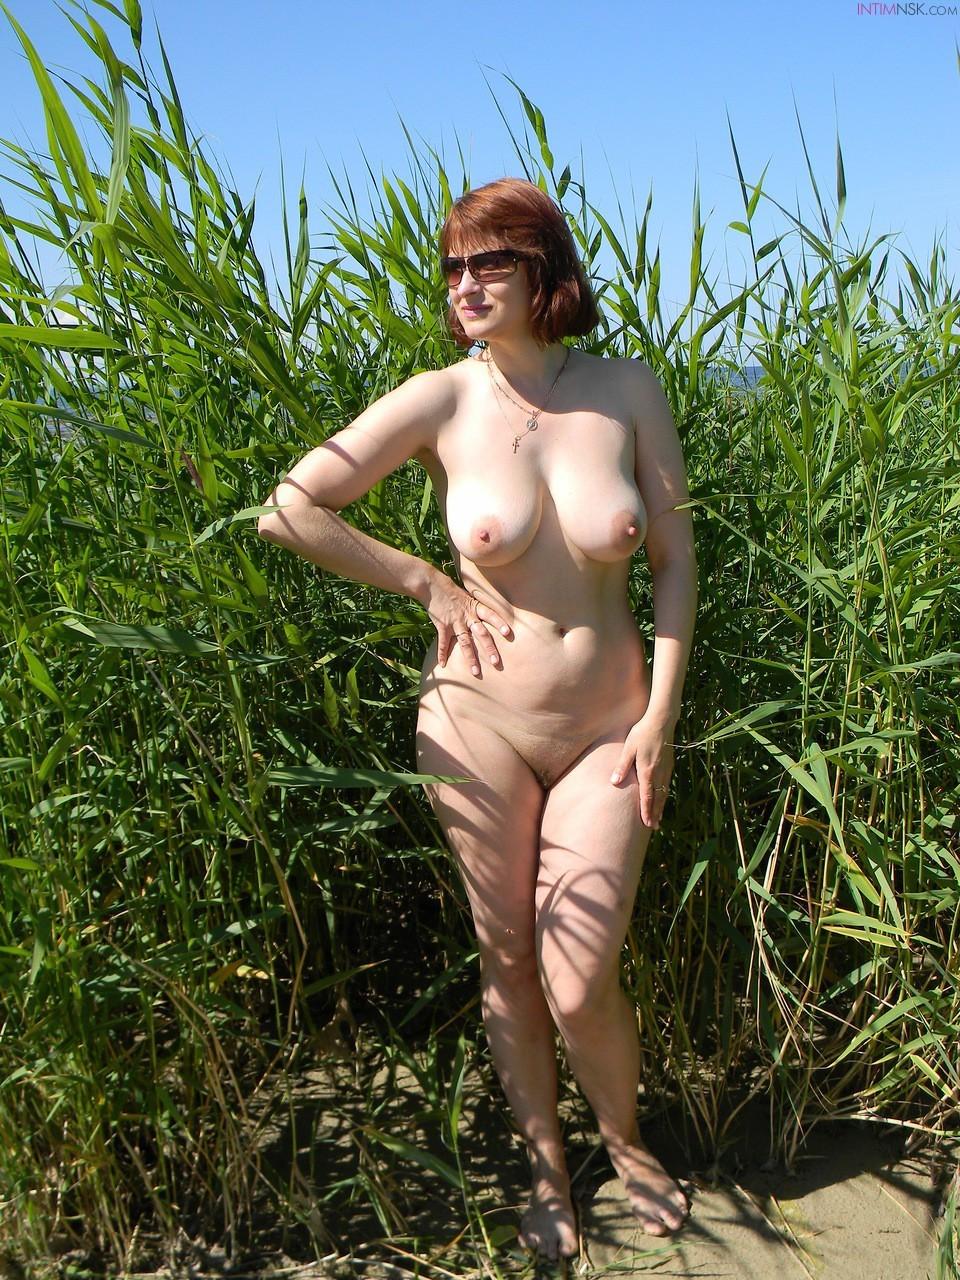 golie-zrelie-tetki-na-prirode